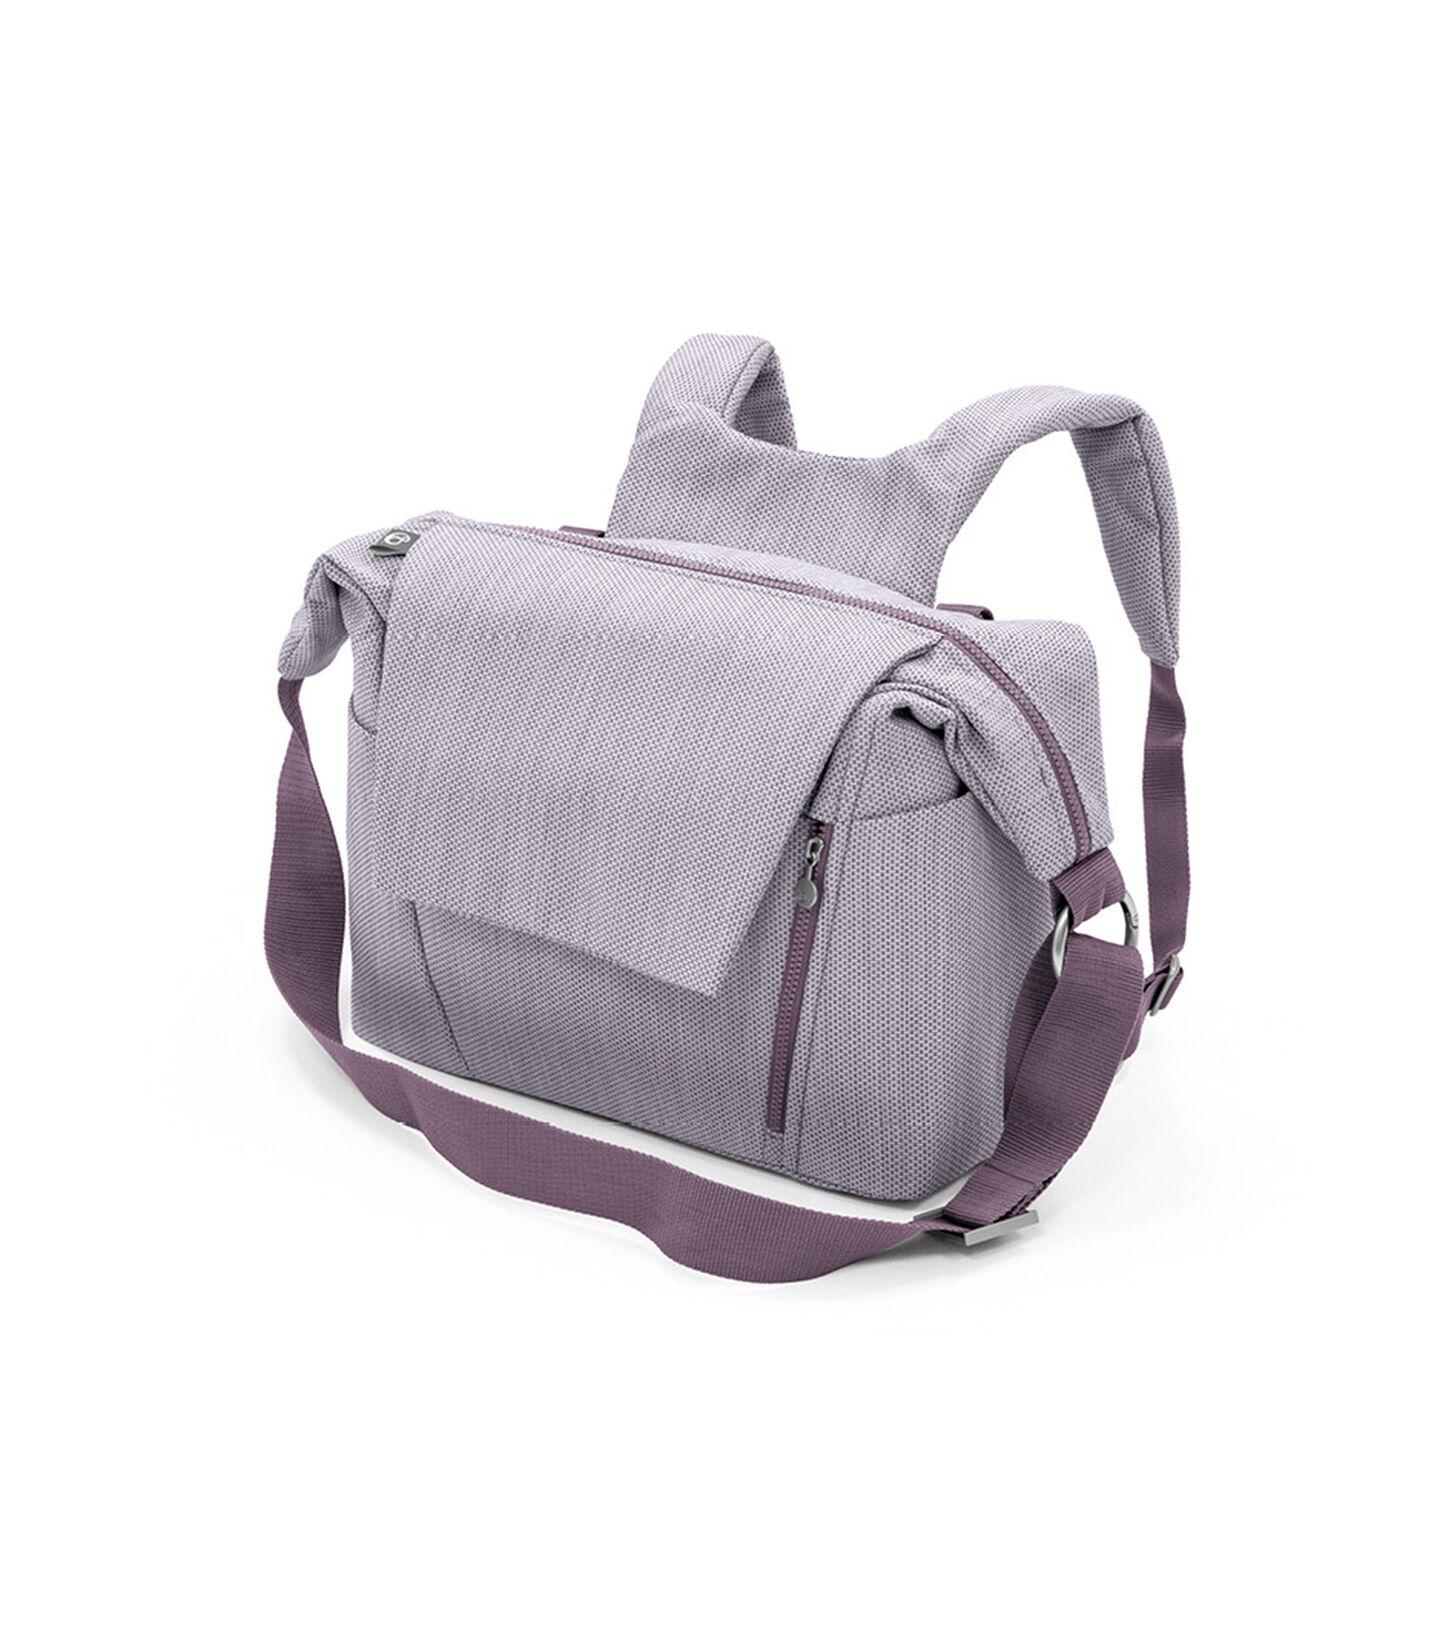 Stokke® Stroller Changing Bag, Brushed Lilac. view 1